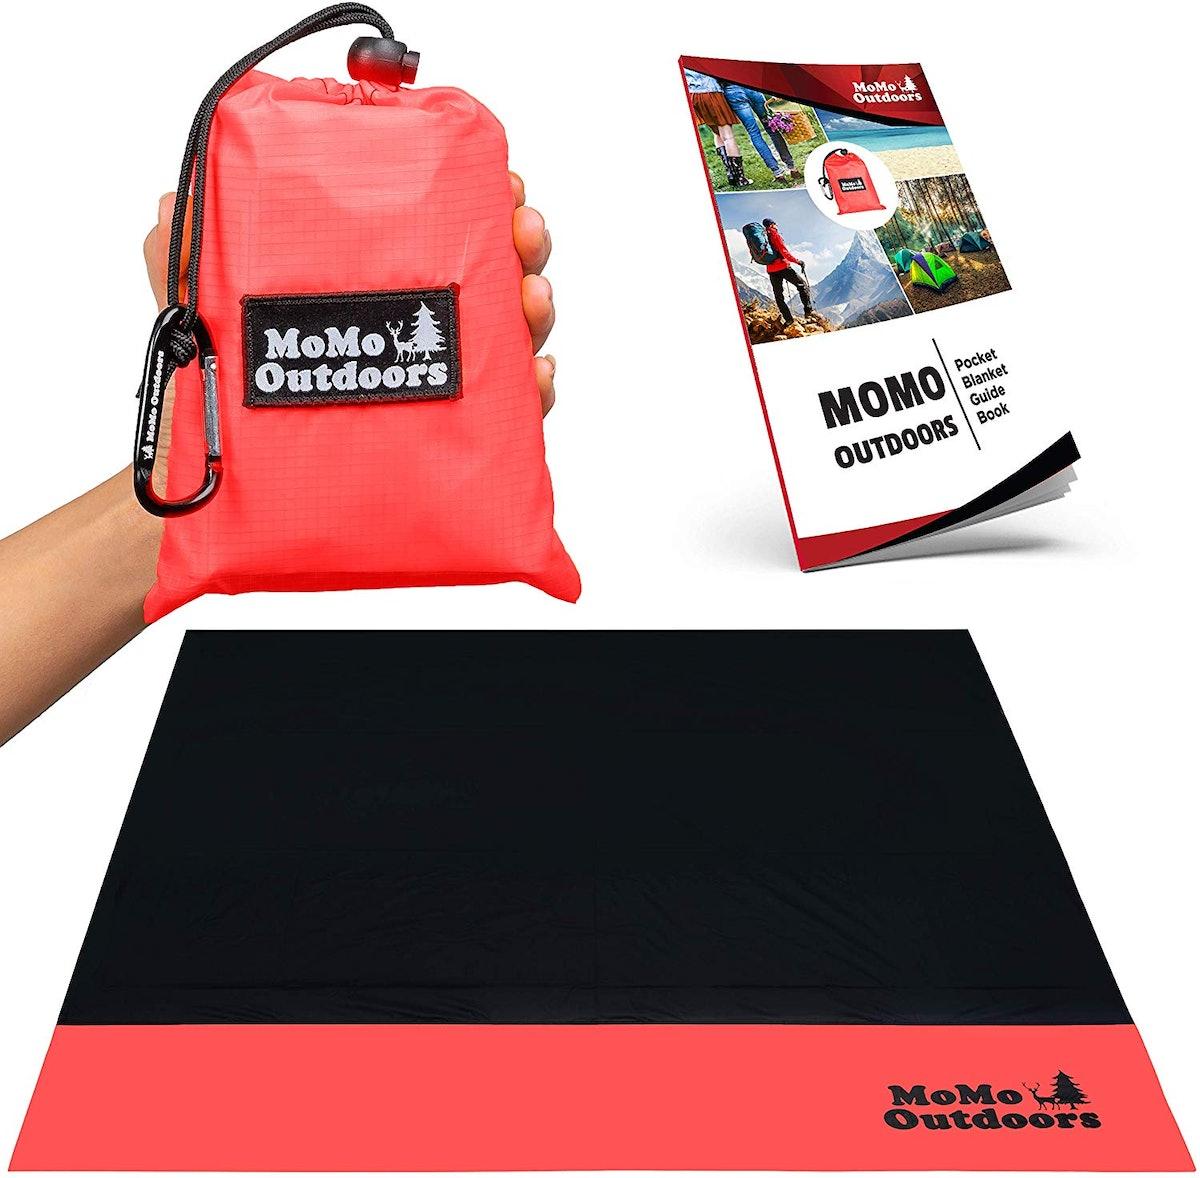 MoMo Outdoors Pocket Blanket